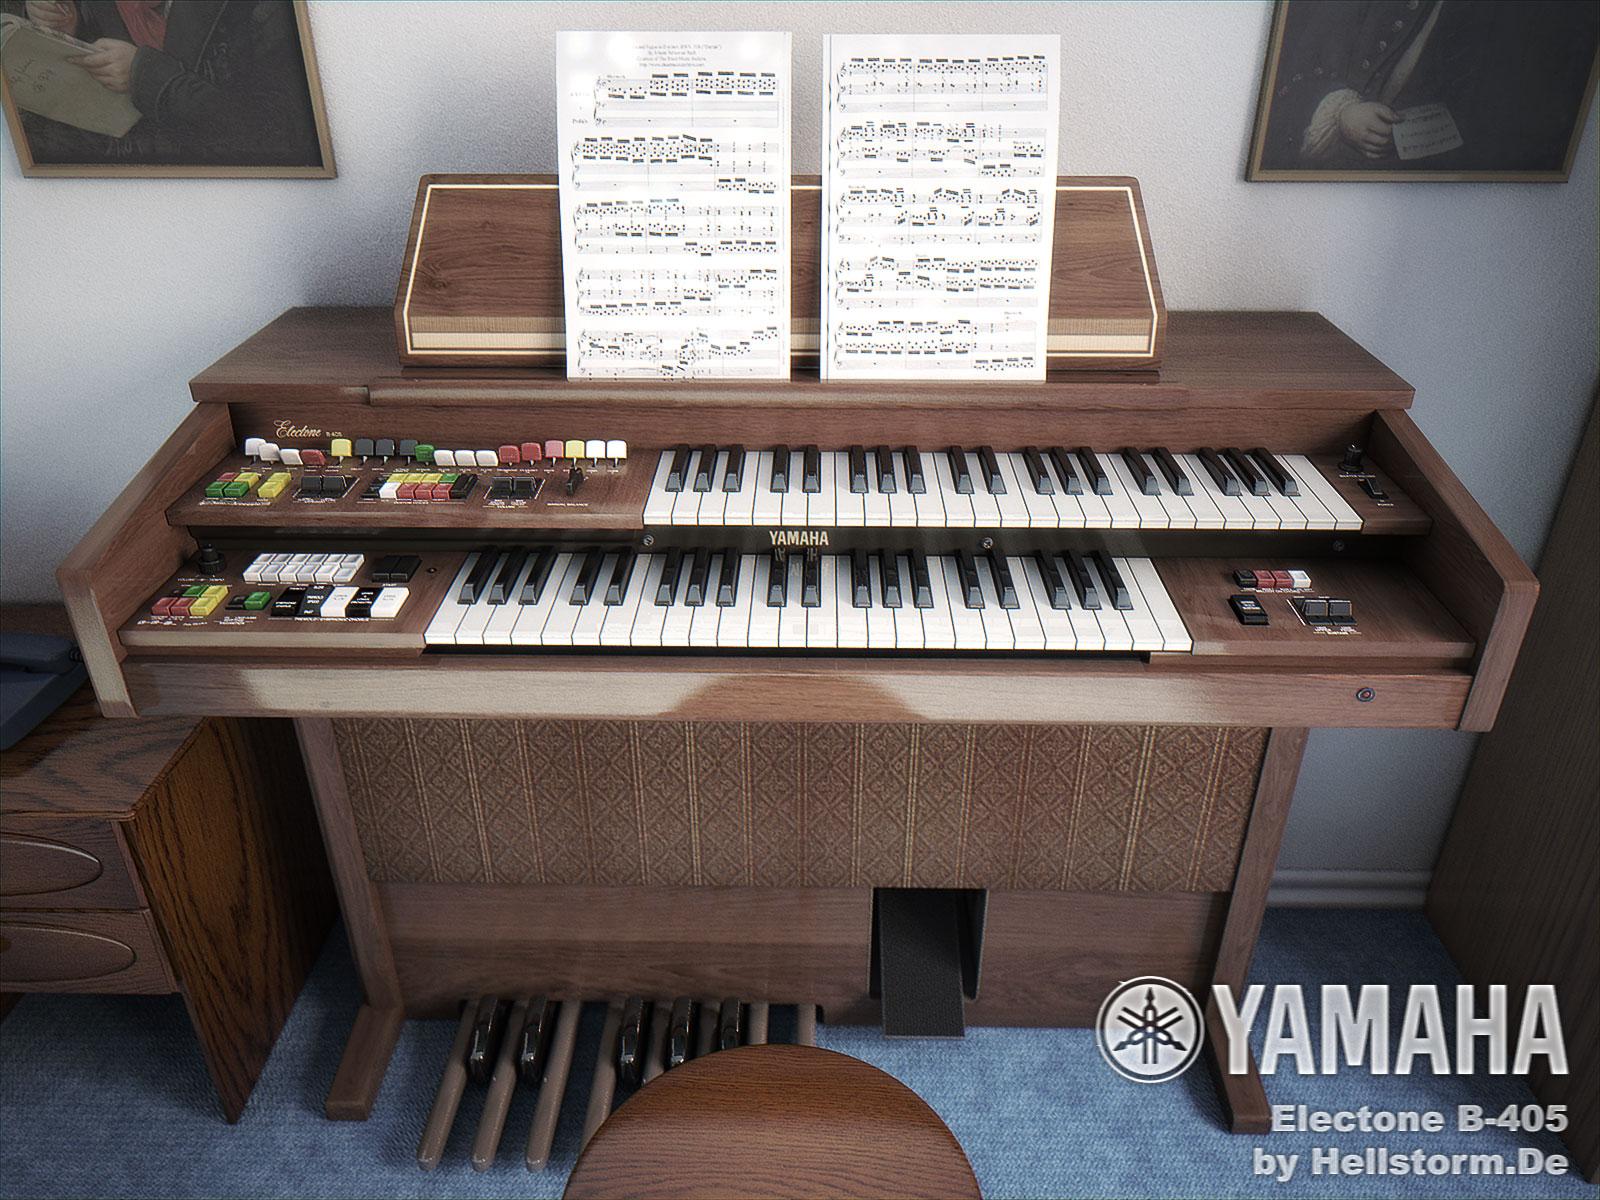 Yamaha Electone B-405 by hellstormde